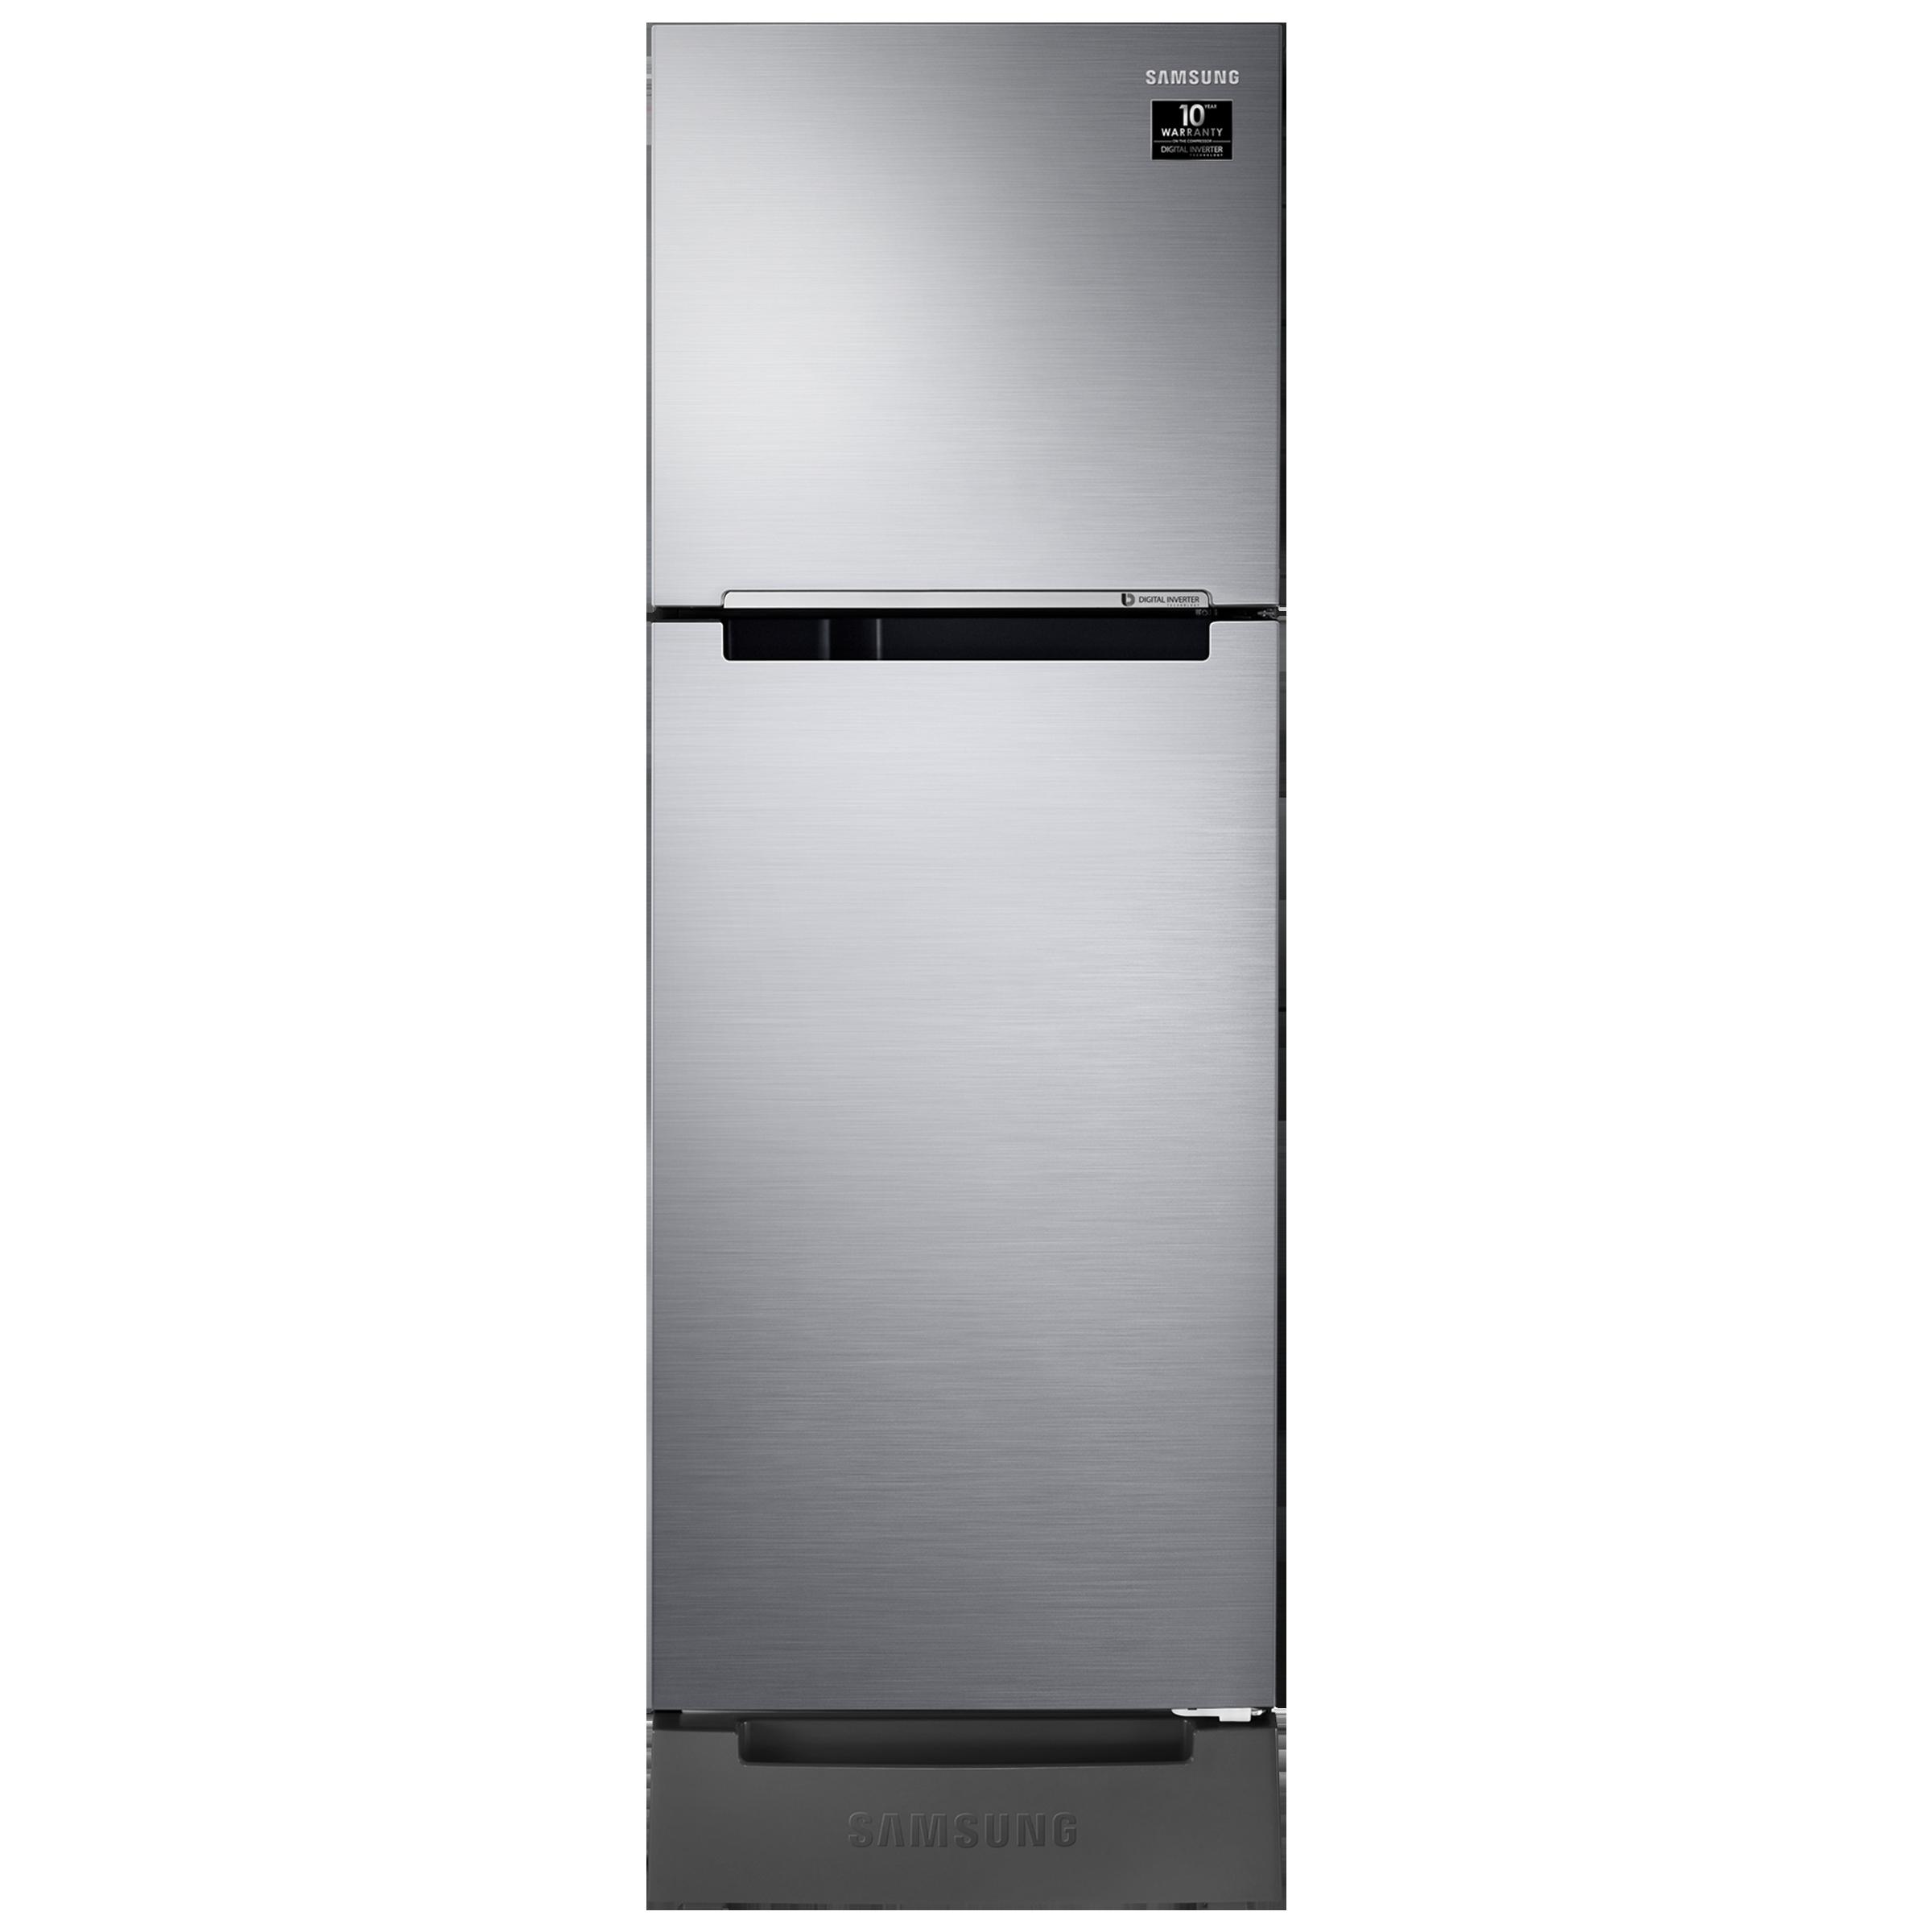 Samsung 253 Litres 2 Star Frost Free Digital Inverter Double Door Refrigerator (Stabilizer Free Operation, RT28A3132S8/HL, Elegant Inox)_1